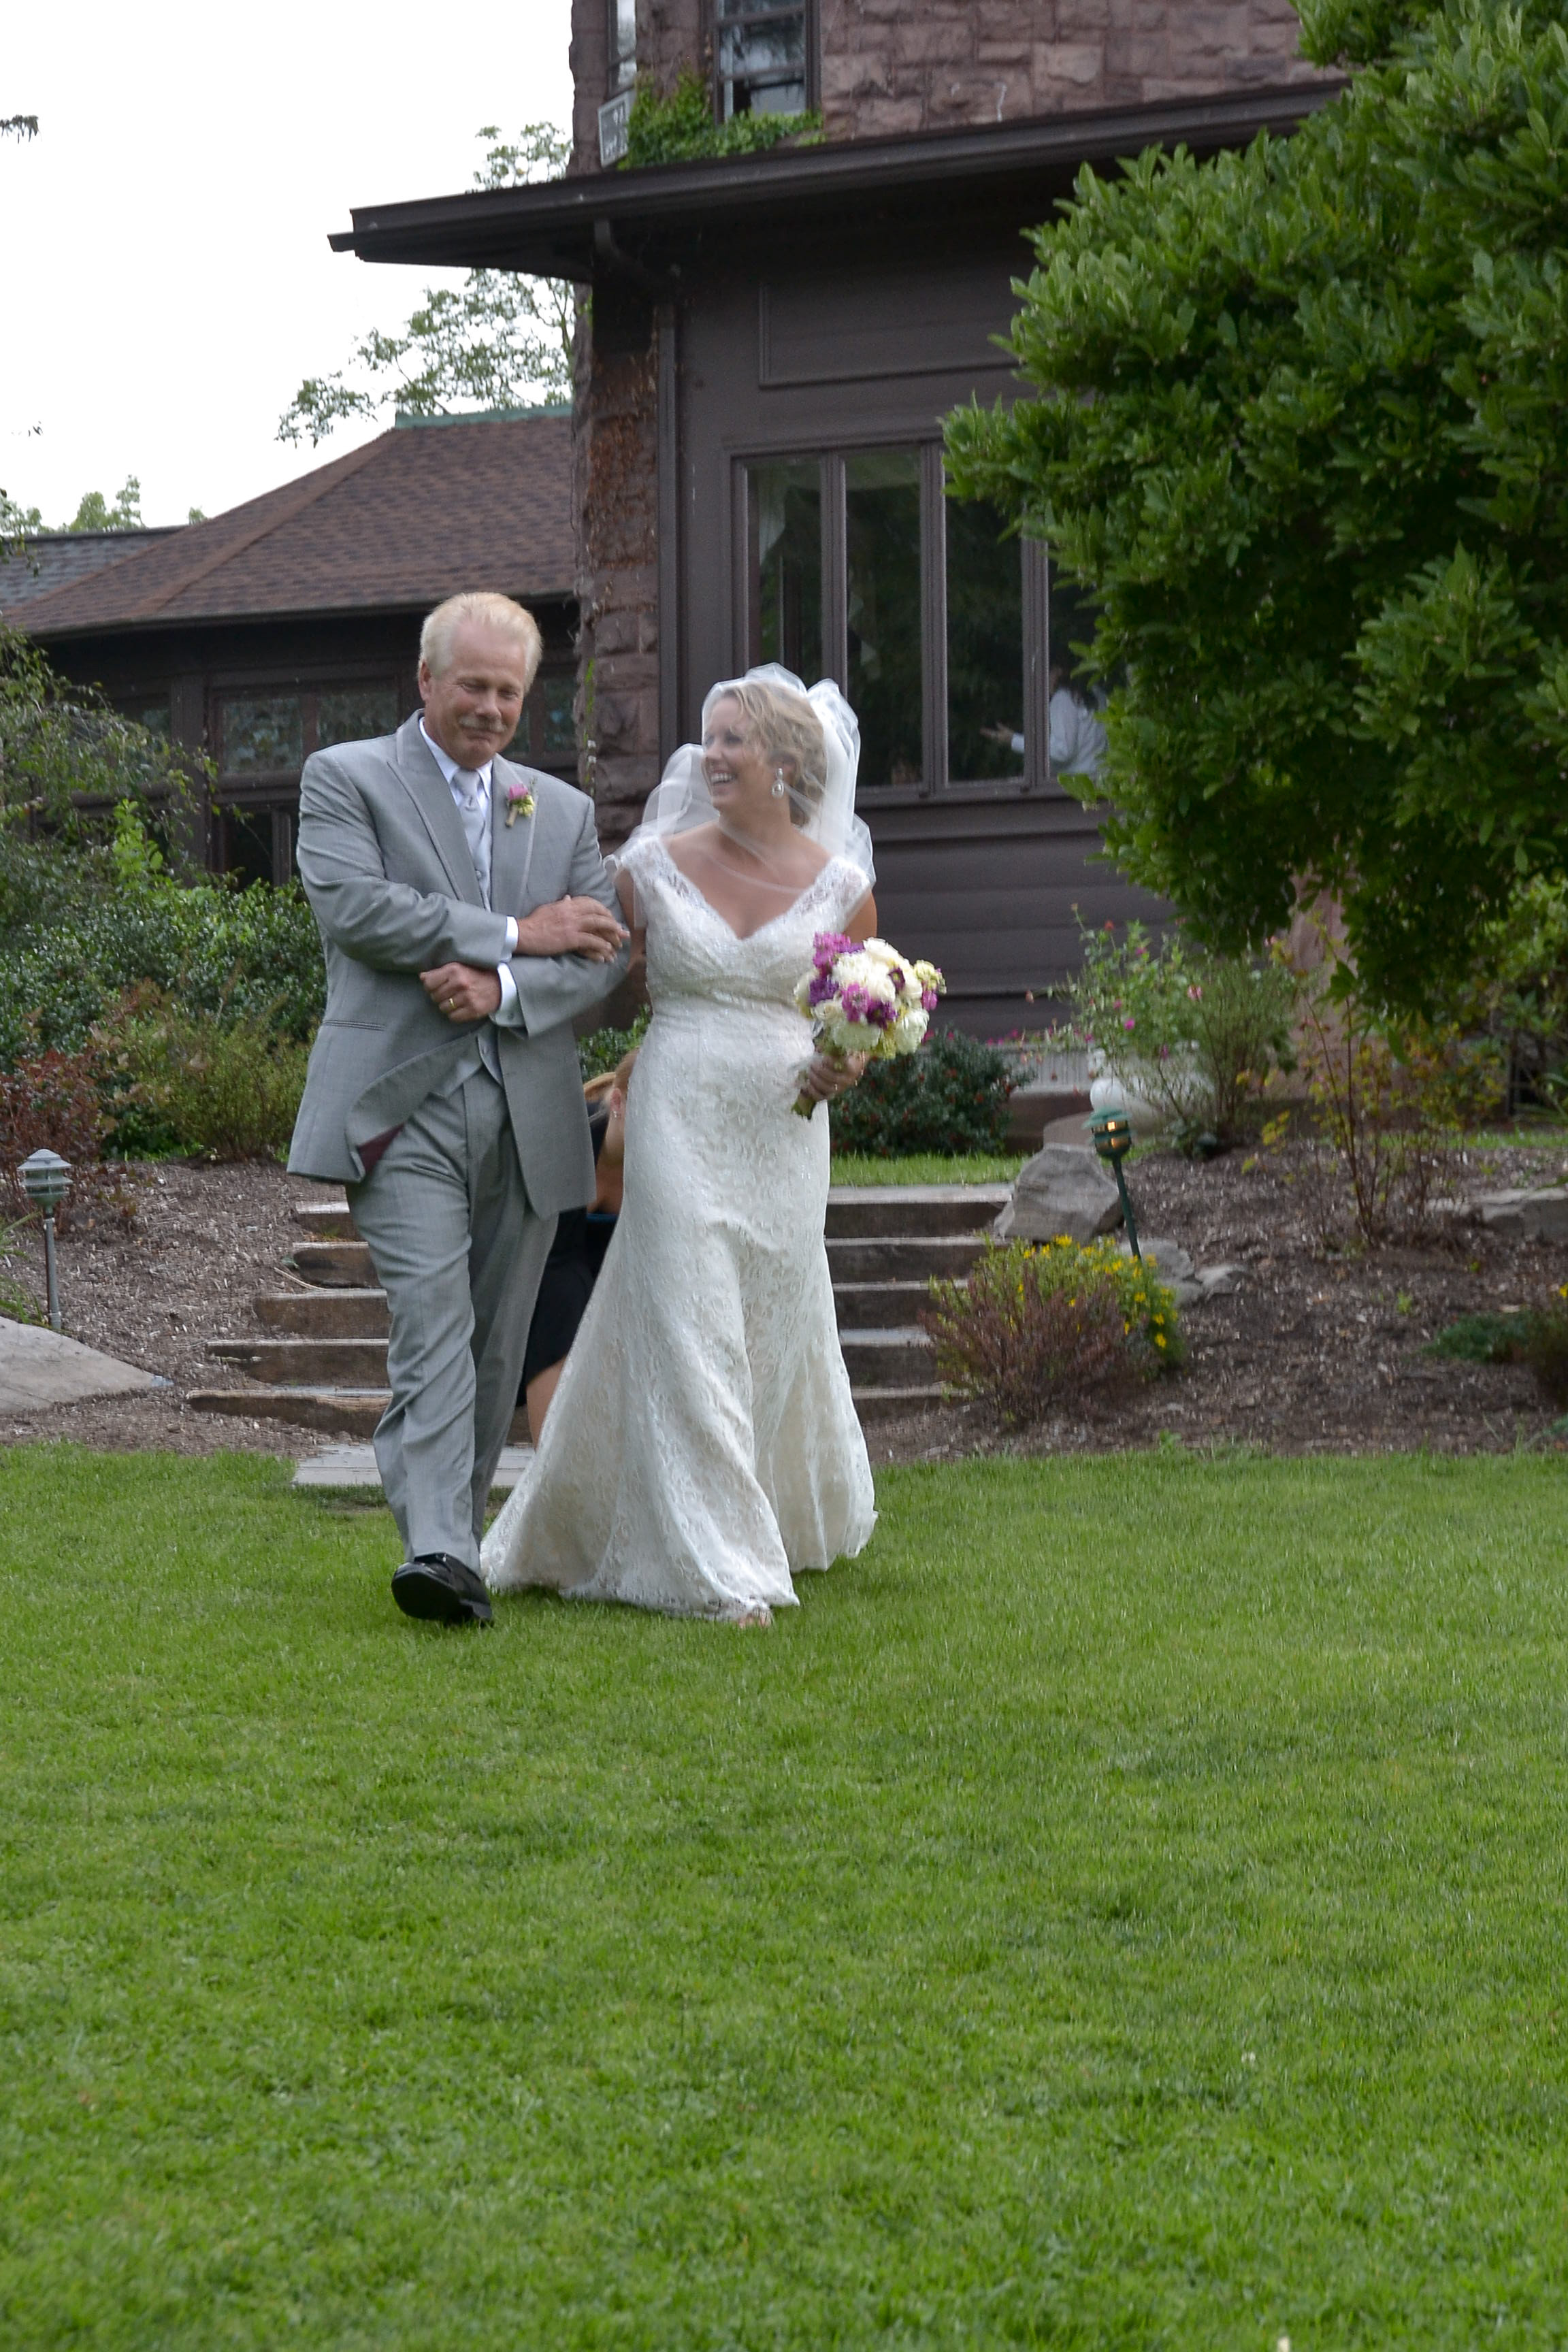 Bride with dad walking to wedding ceremony.